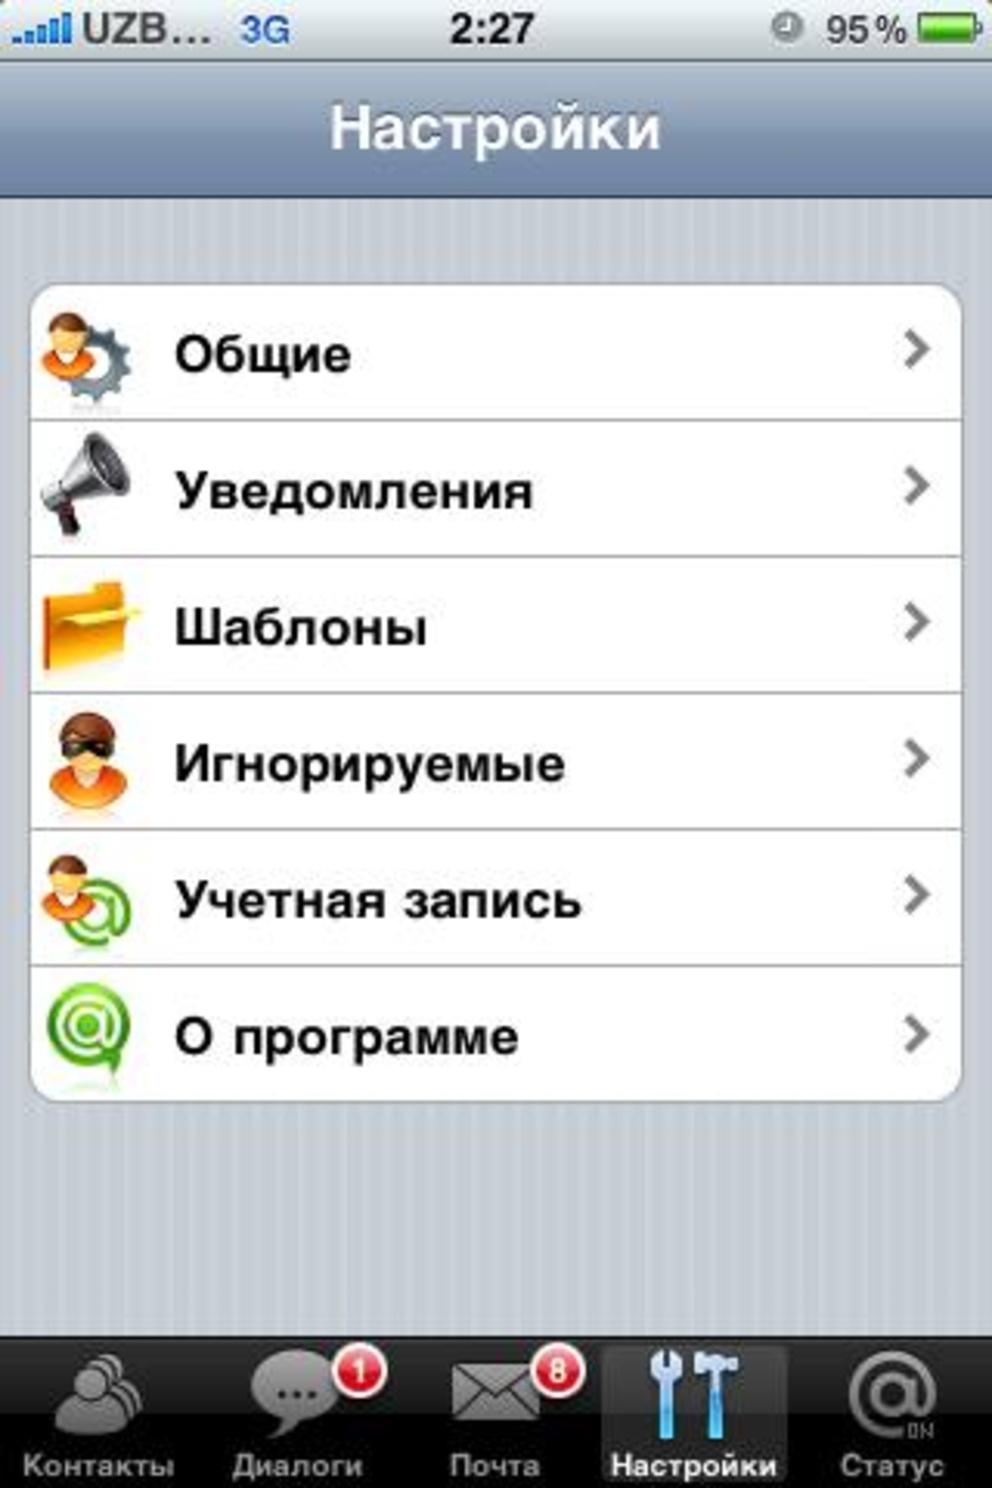 Mail.ru Агент для iPhone / Проект компании Enterra